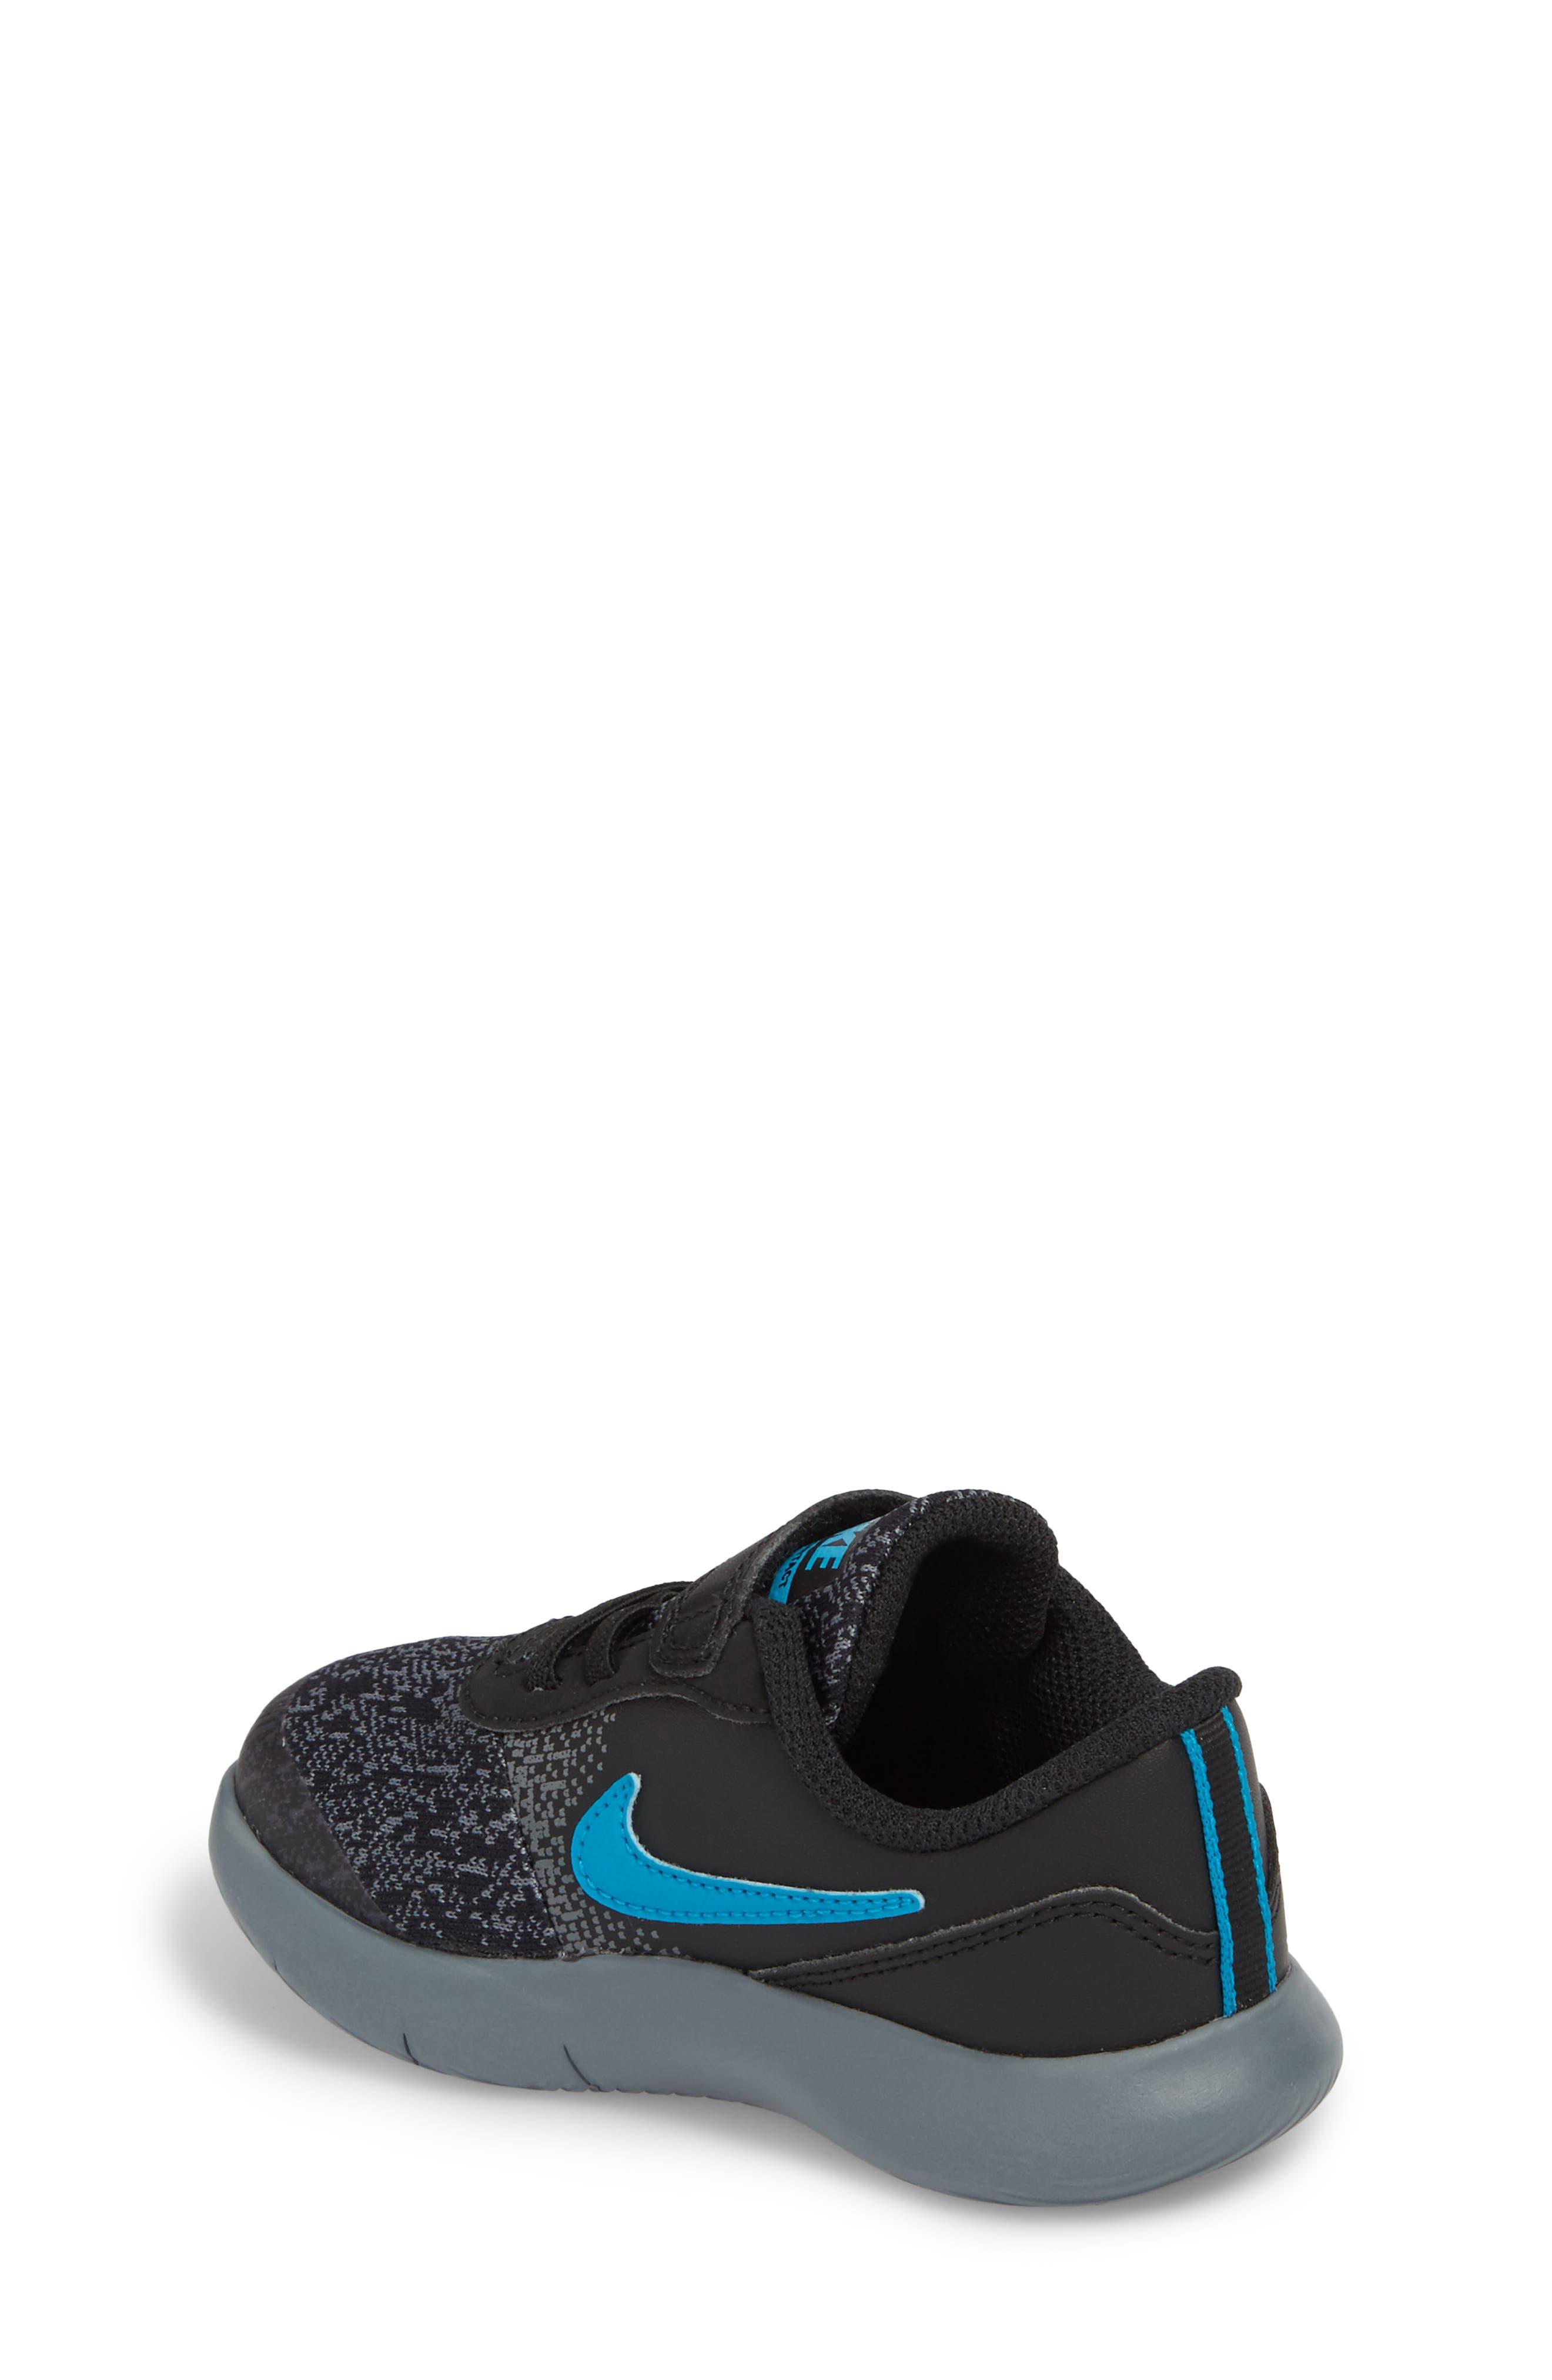 Alternate Image 2  - Nike Flex Contact Running Shoe (Baby, Walker, Toddler & Little Kid)